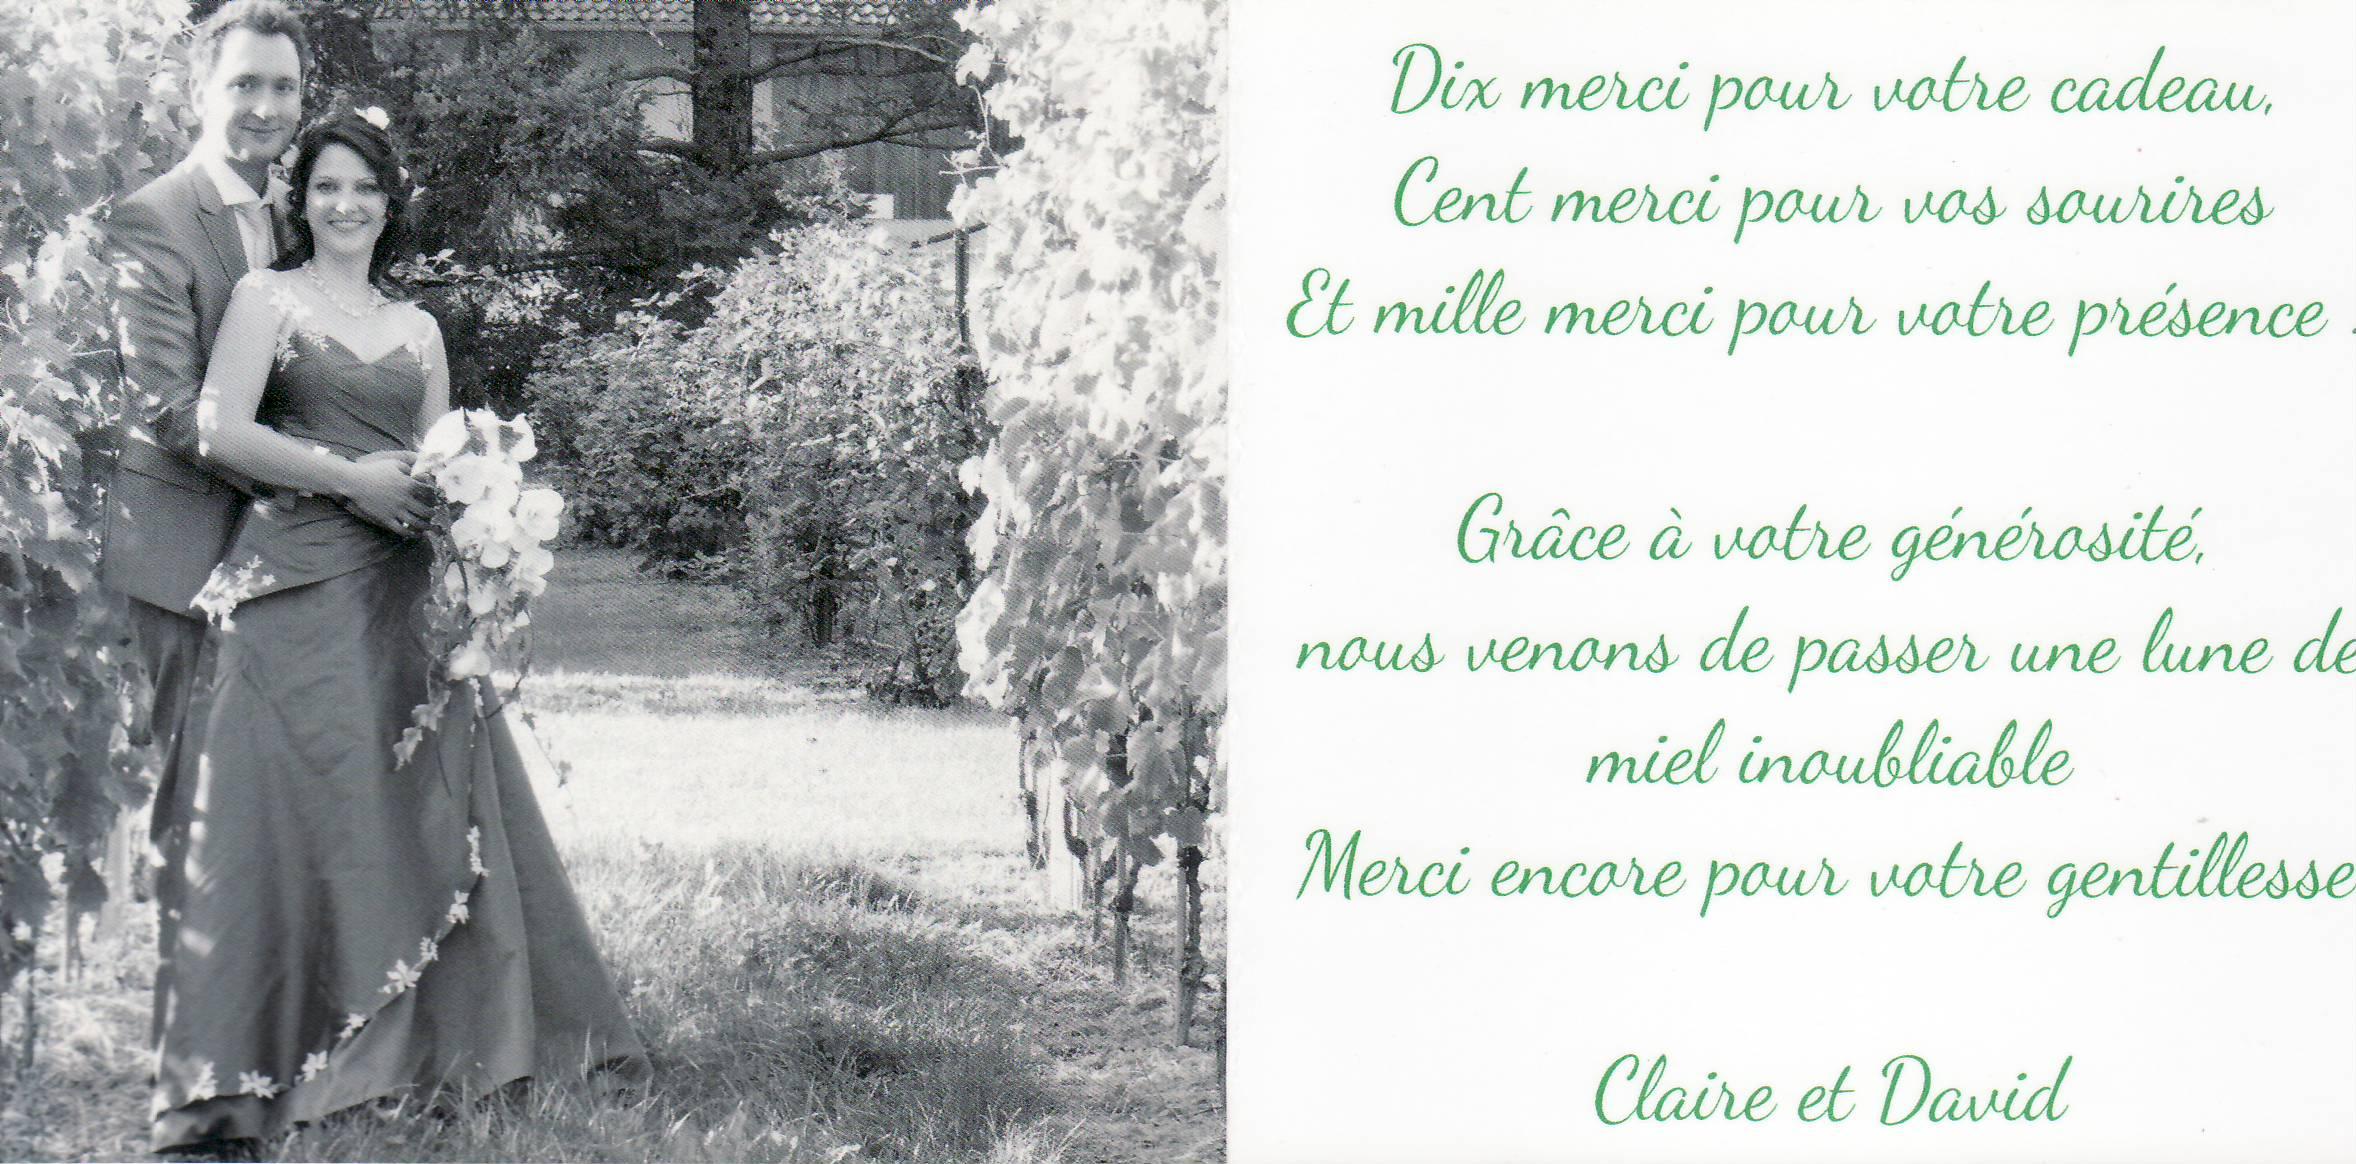 Mariage VINCENT David & Claire (Bracarolle Prangins) (23-08-2014).JPG